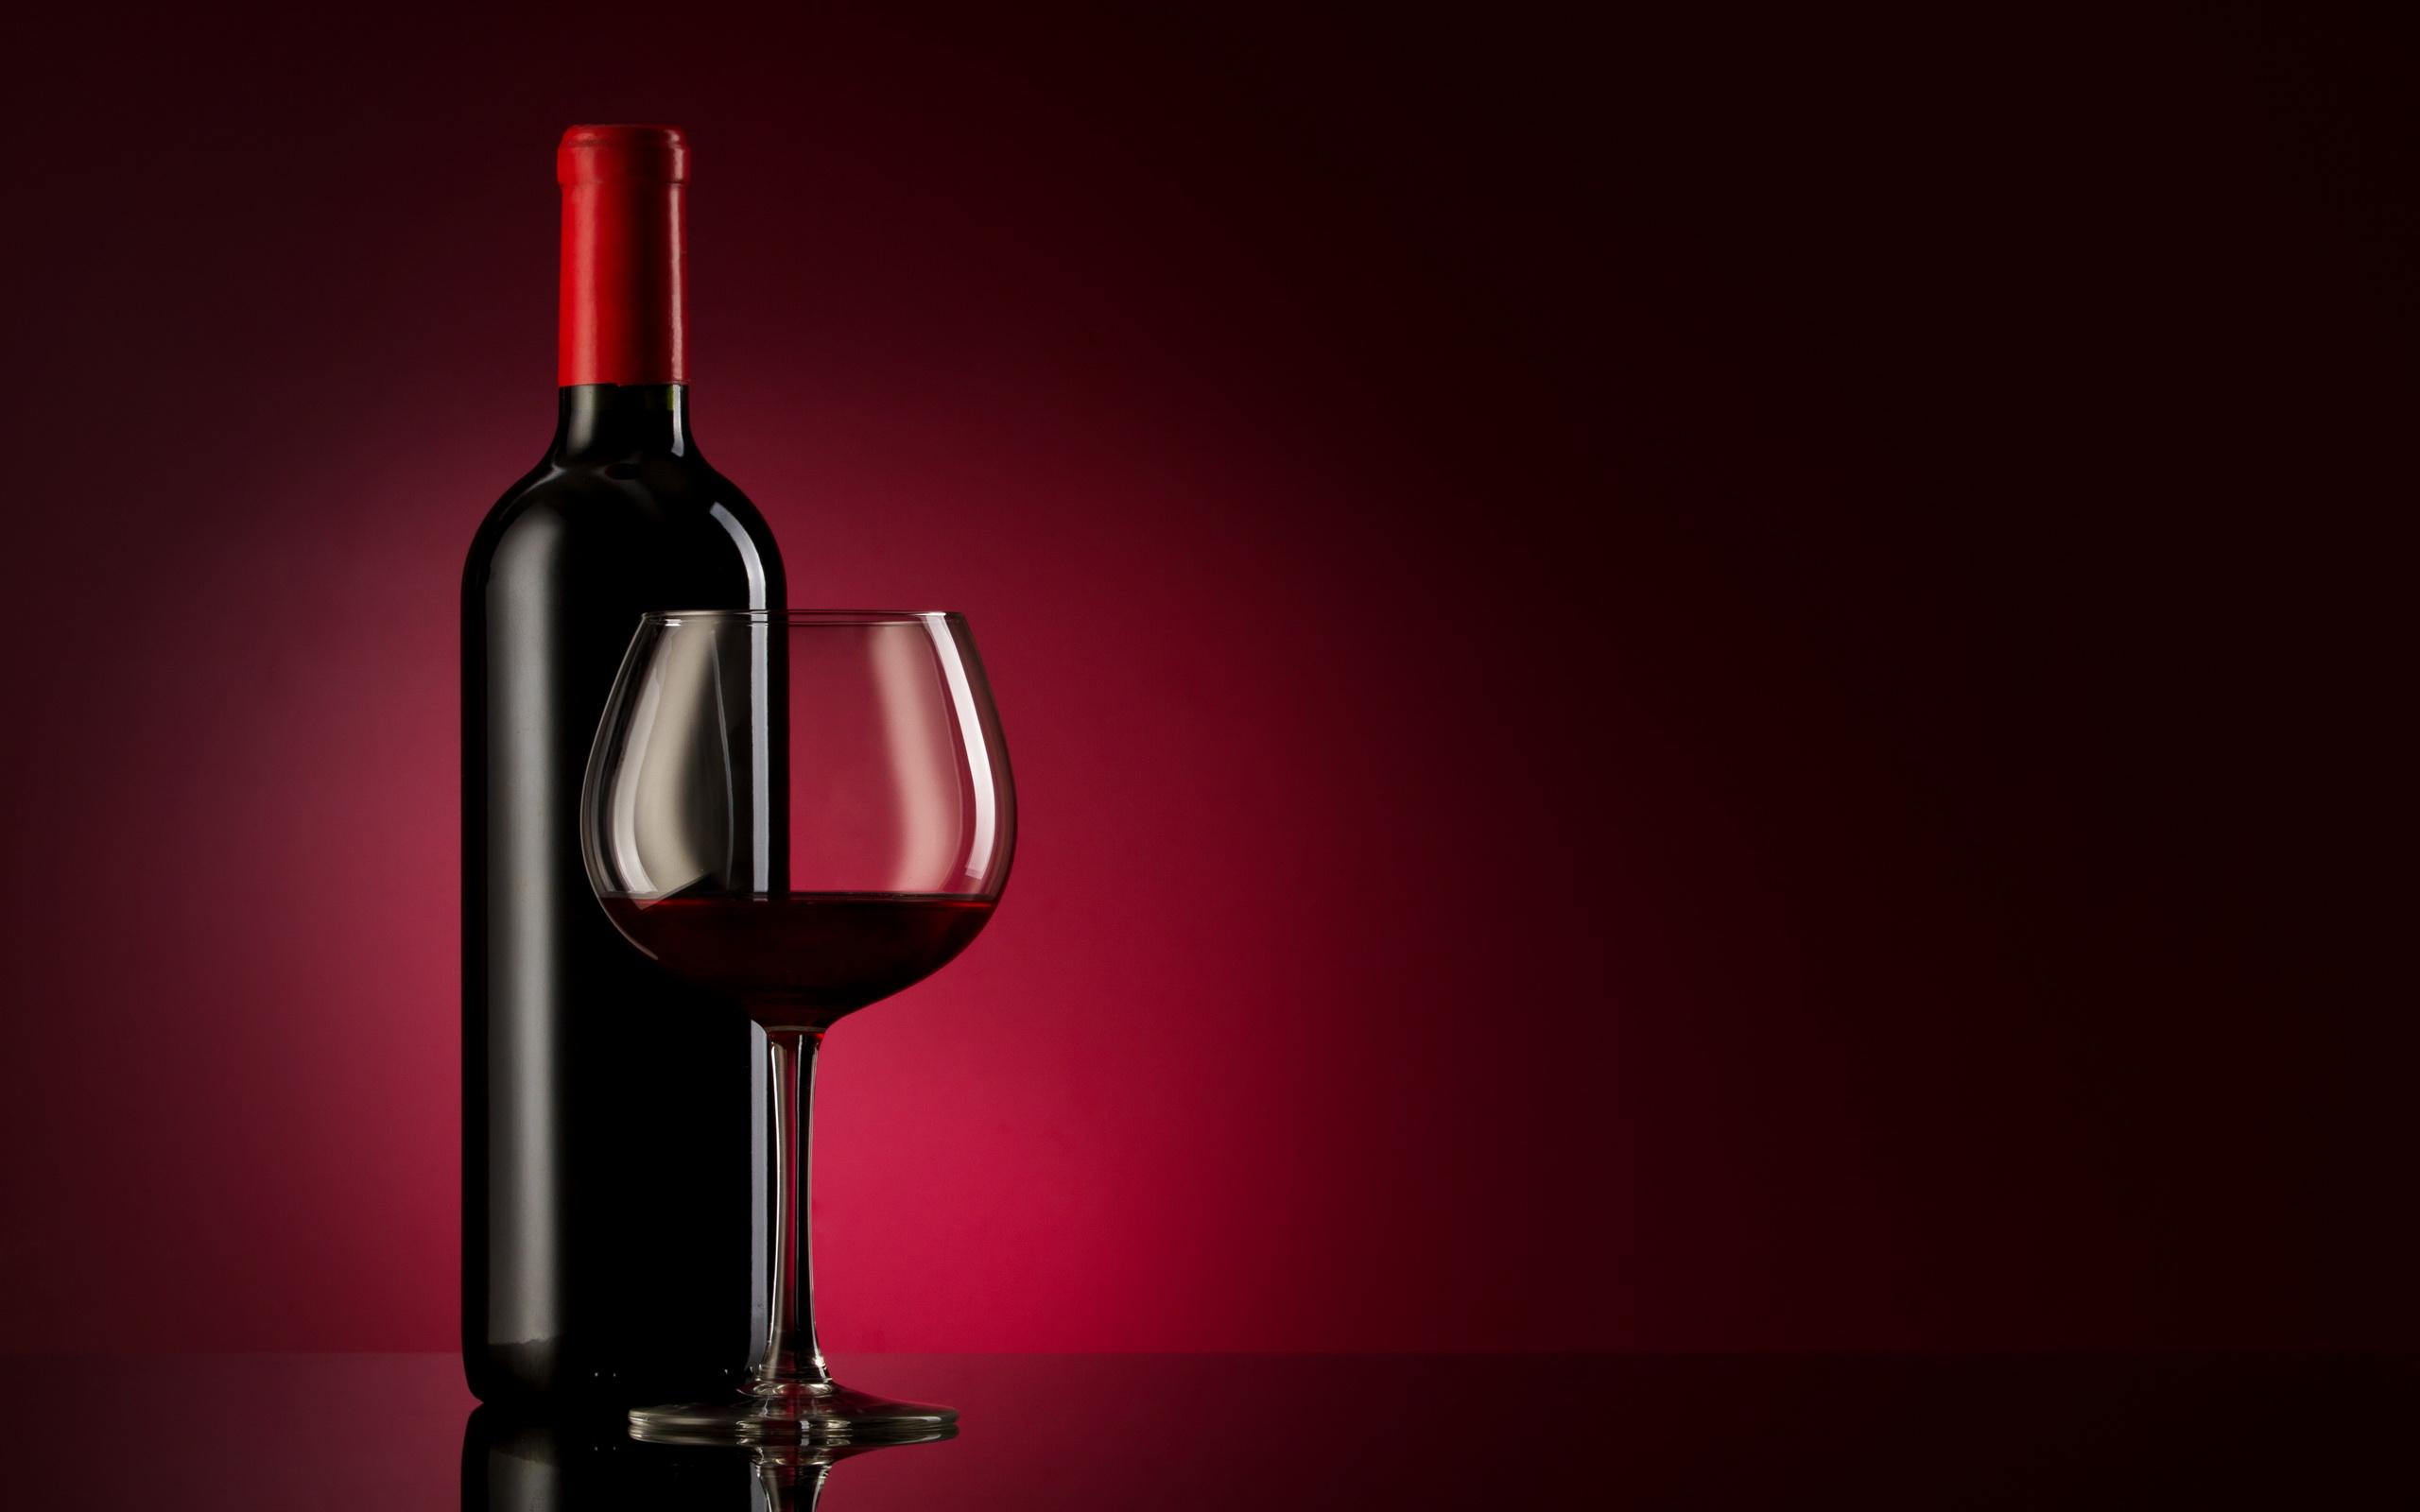 3d wine bottle wallpaper background 62573